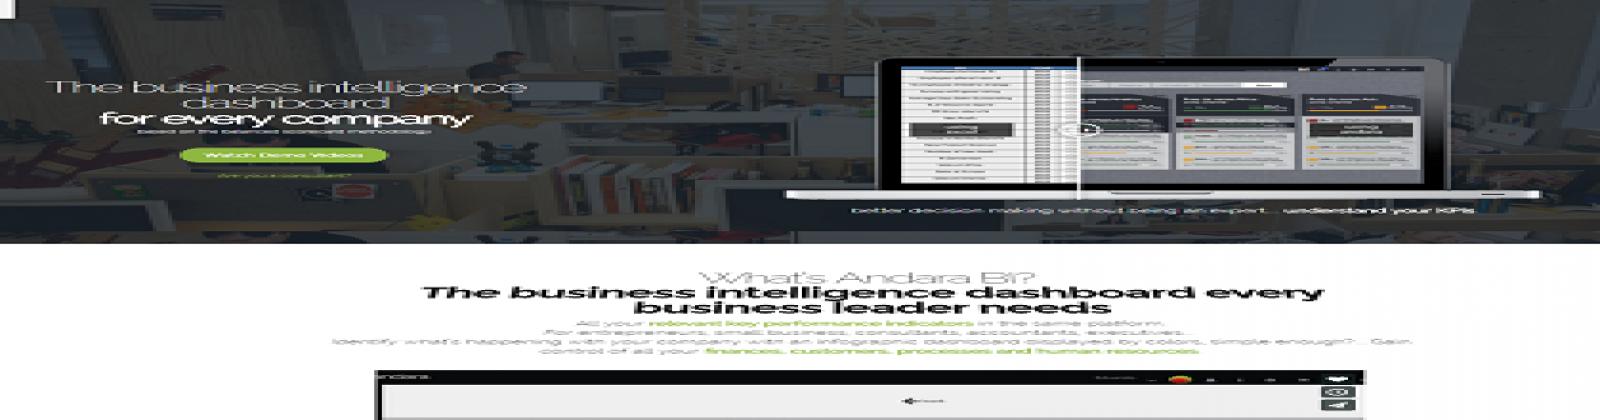 Internet Business,1188